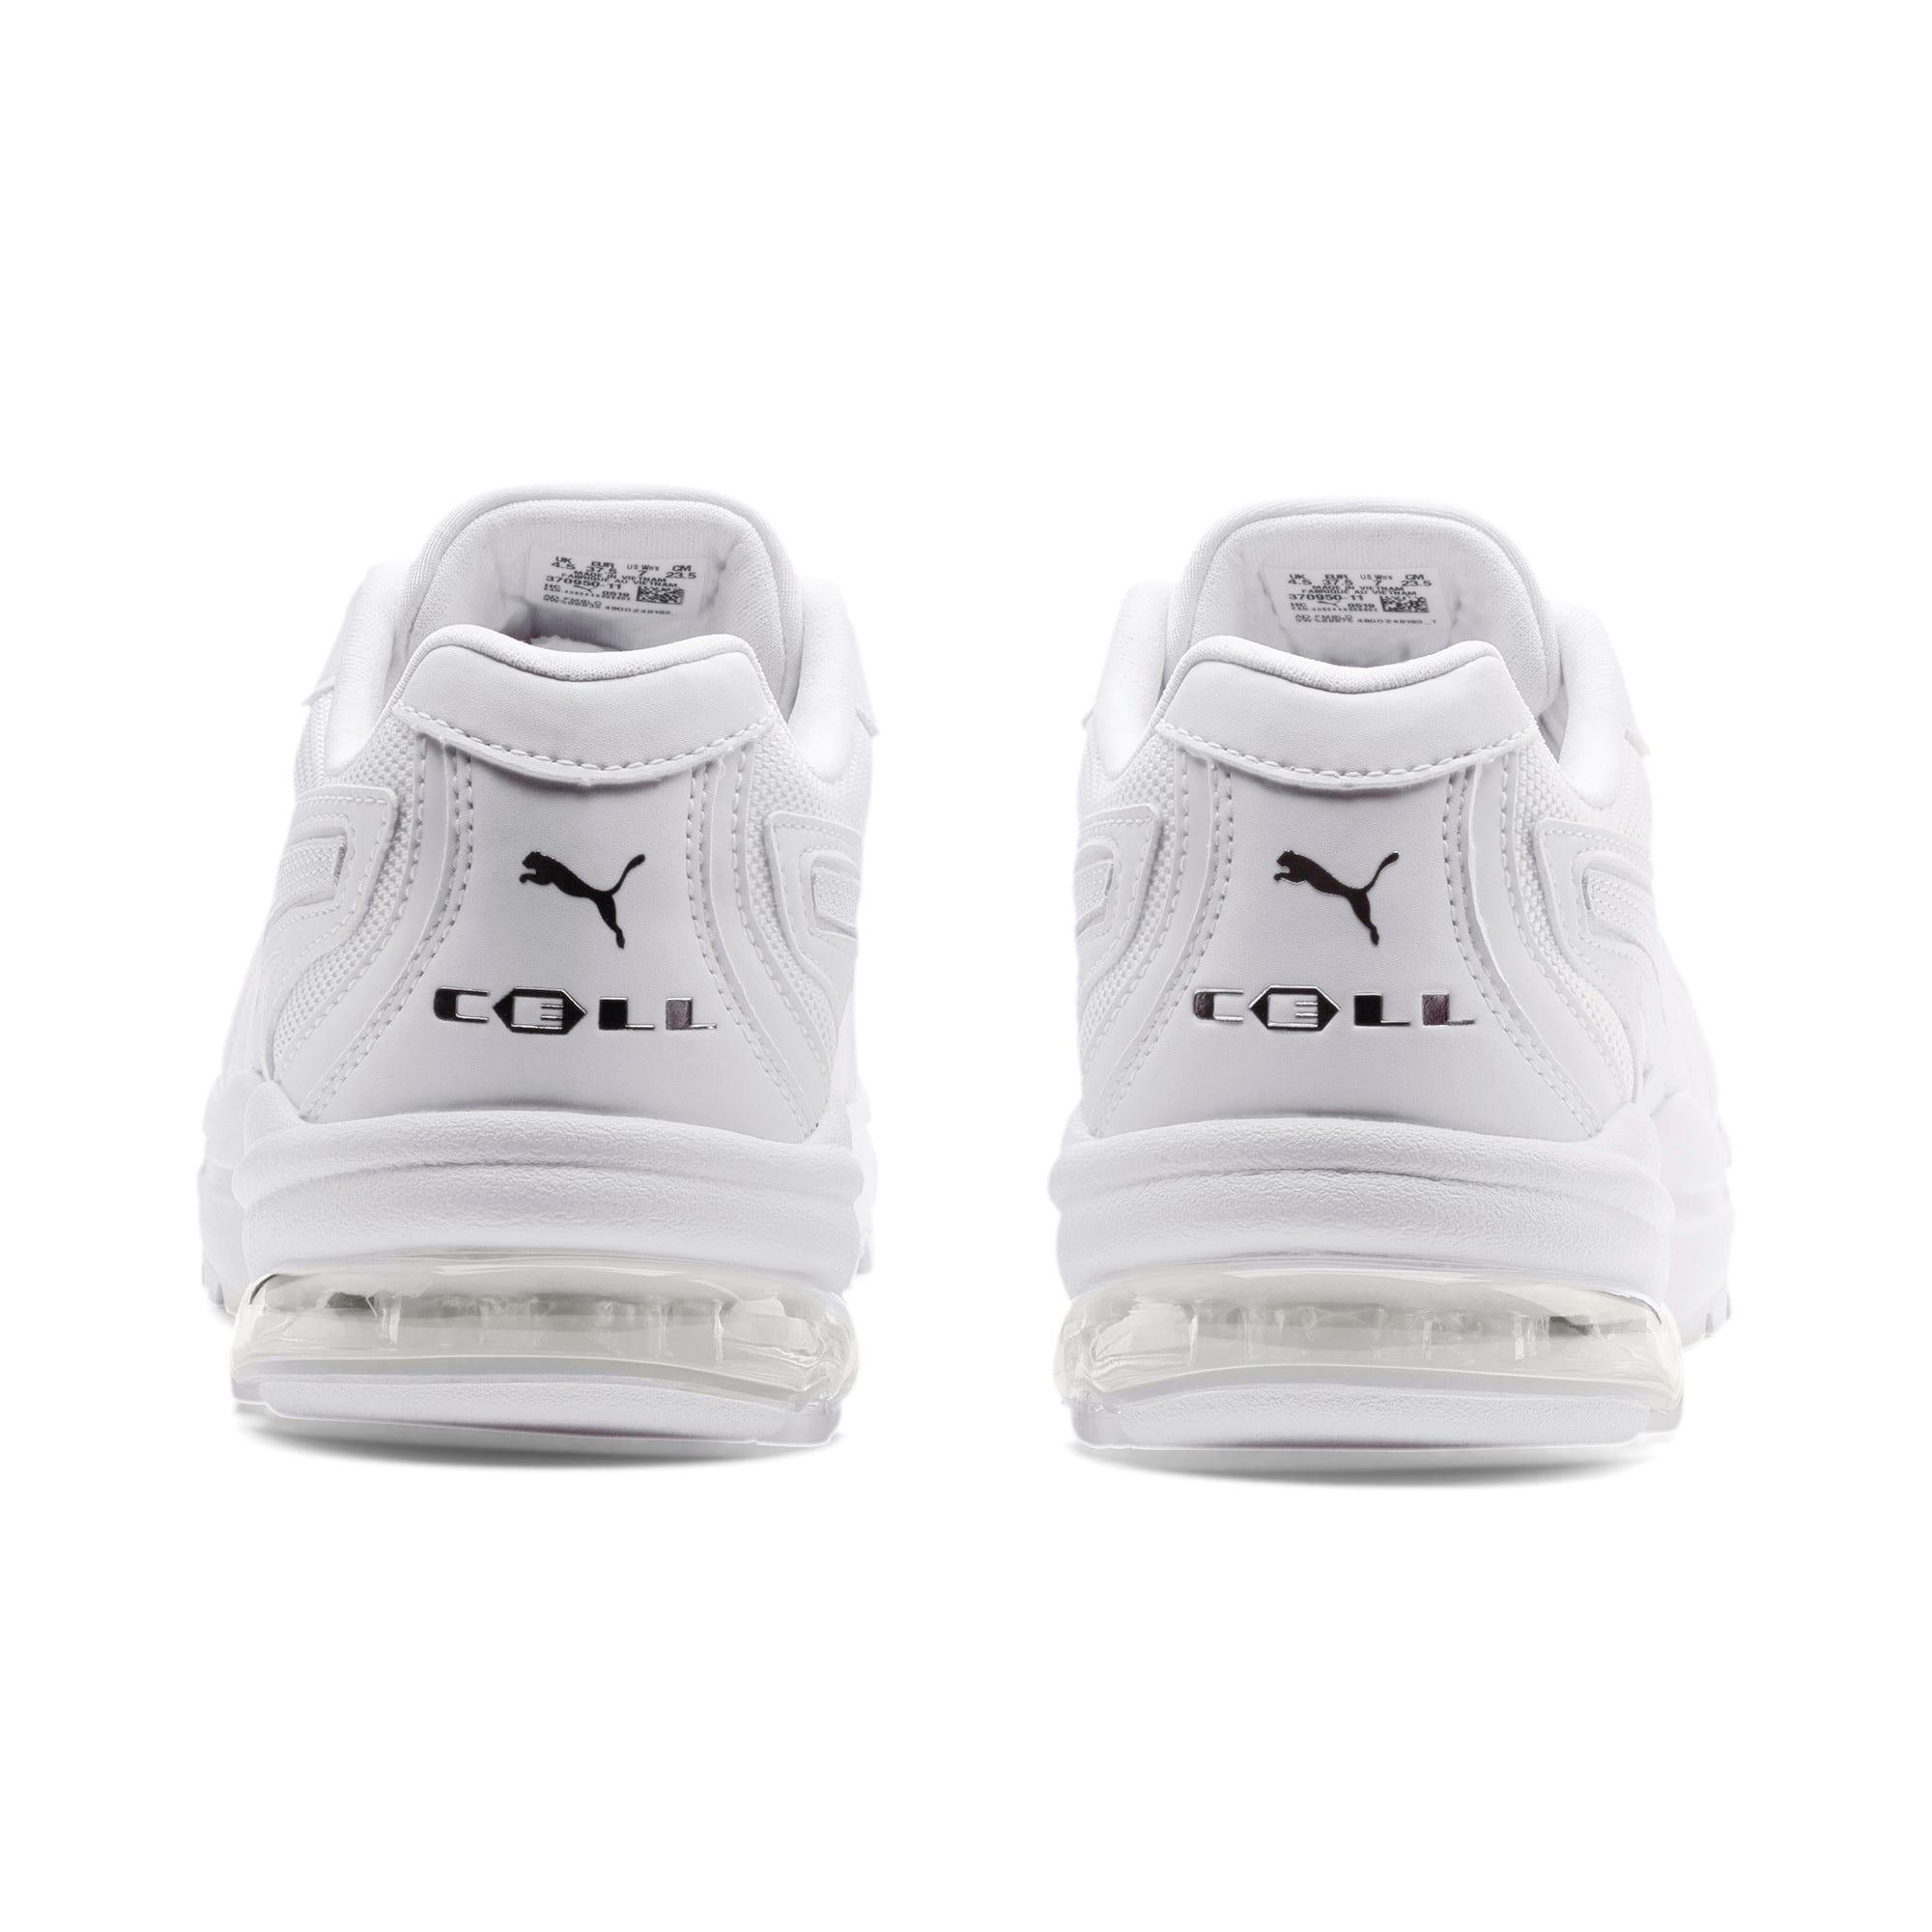 Imagen en miniatura 3 de Zapatillas de mujer CELL Stellar, Puma White-Silver, mediana